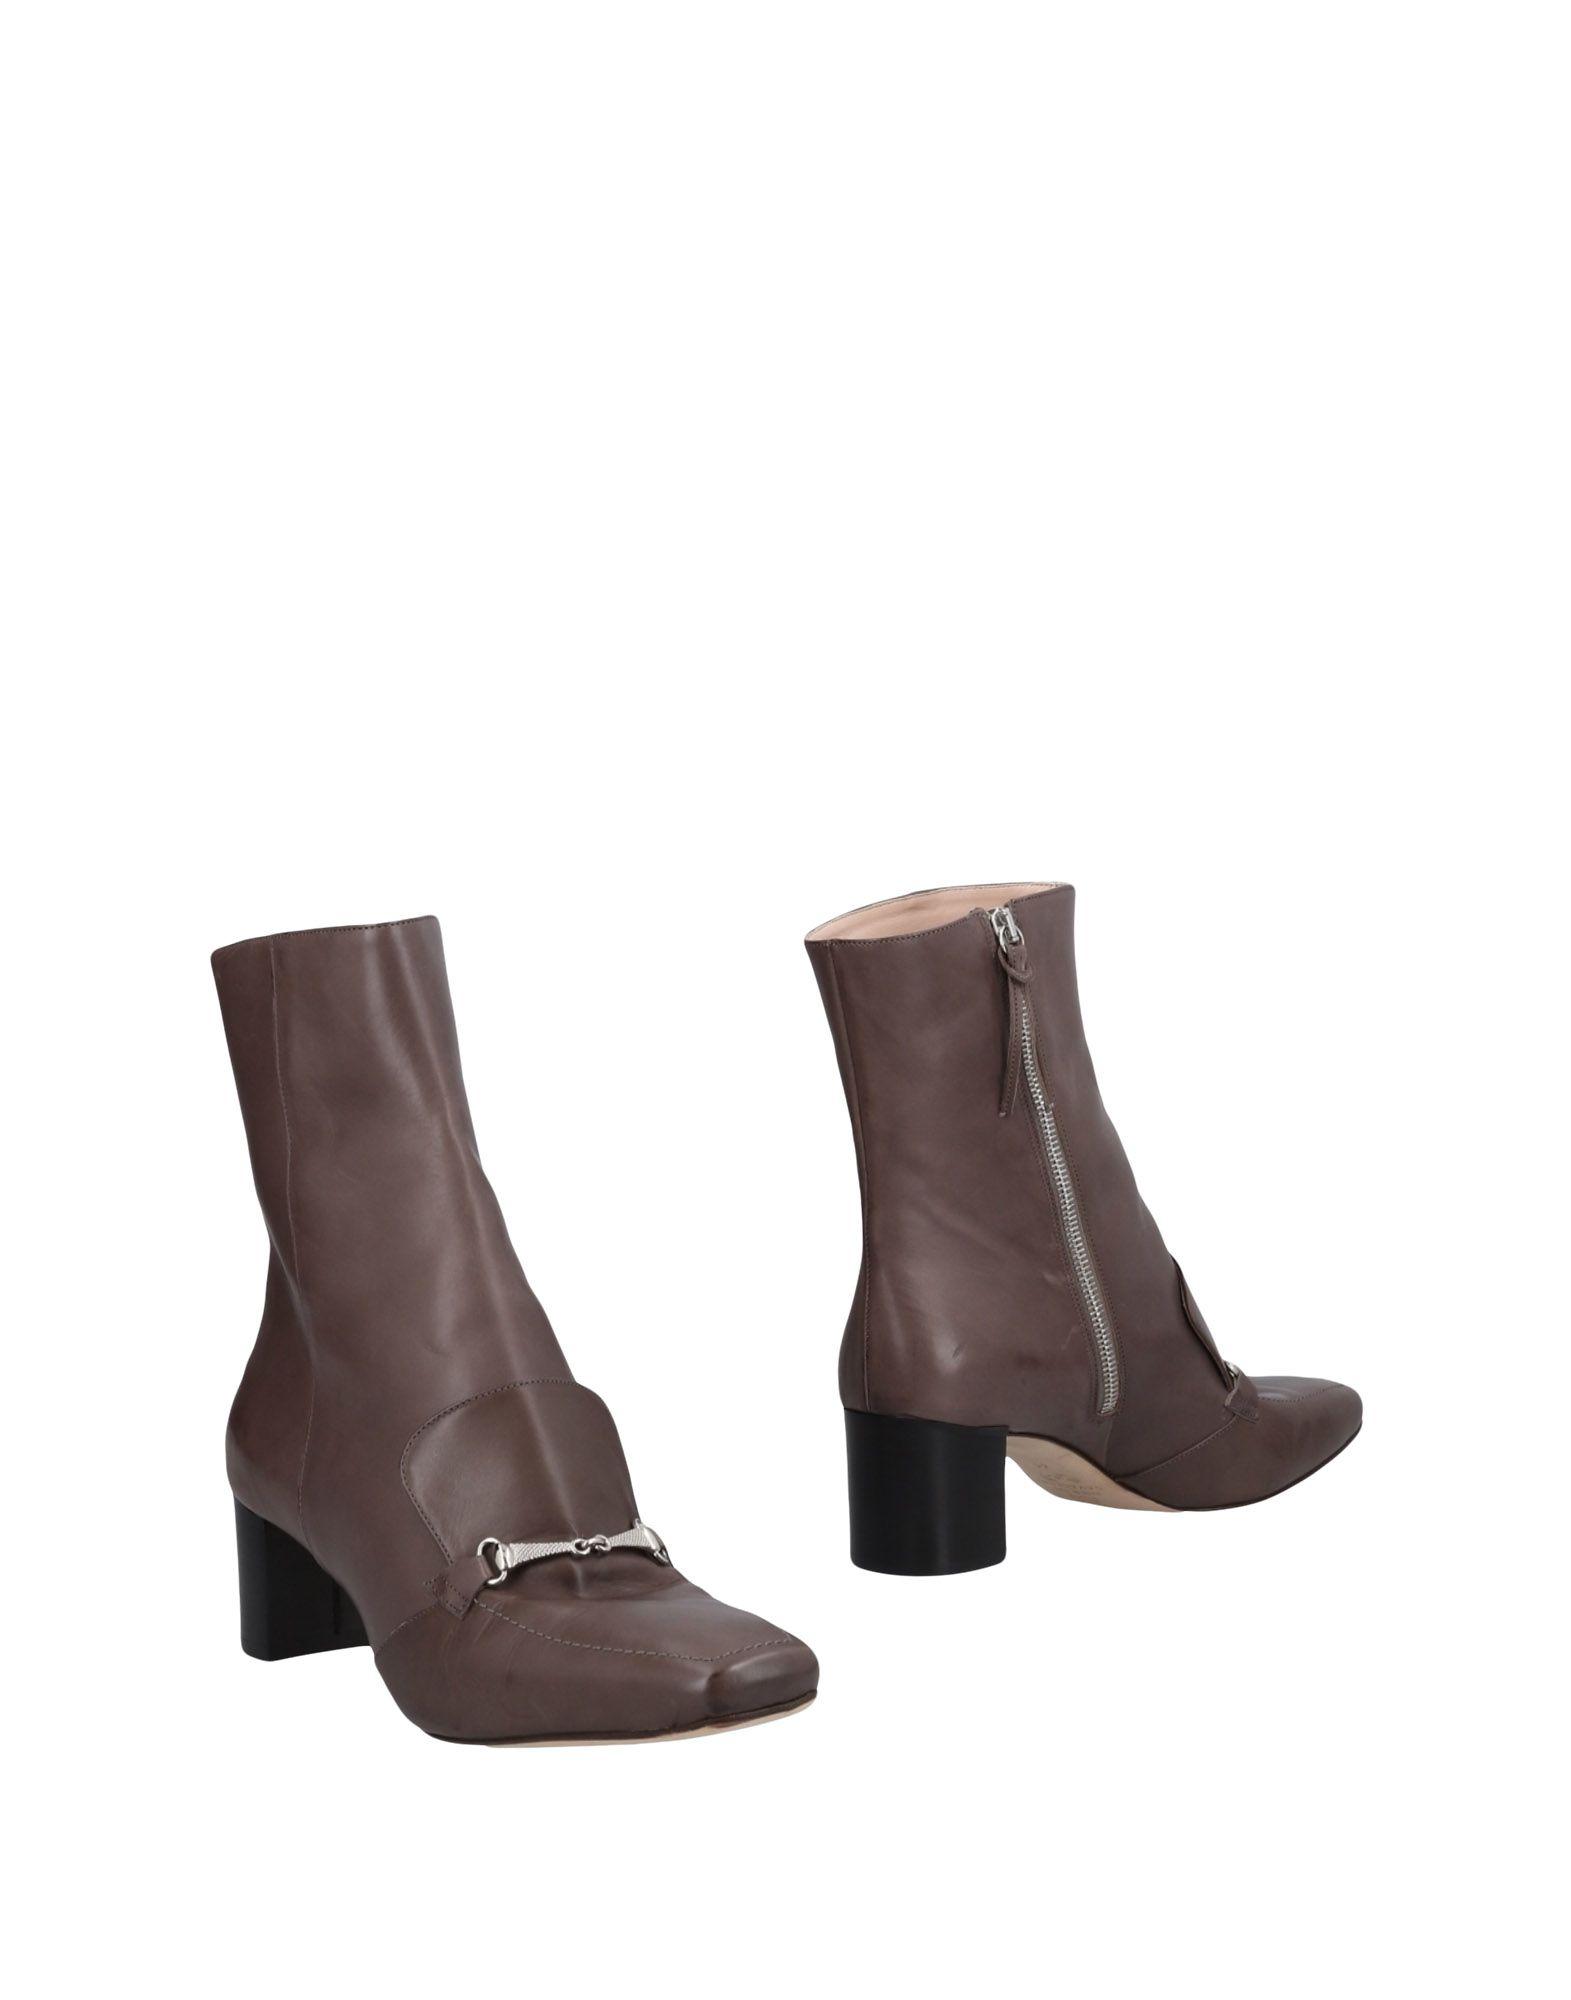 Cavallini Stiefelette strapazierfähige Damen  11483667WWGut aussehende strapazierfähige Stiefelette Schuhe 2961aa